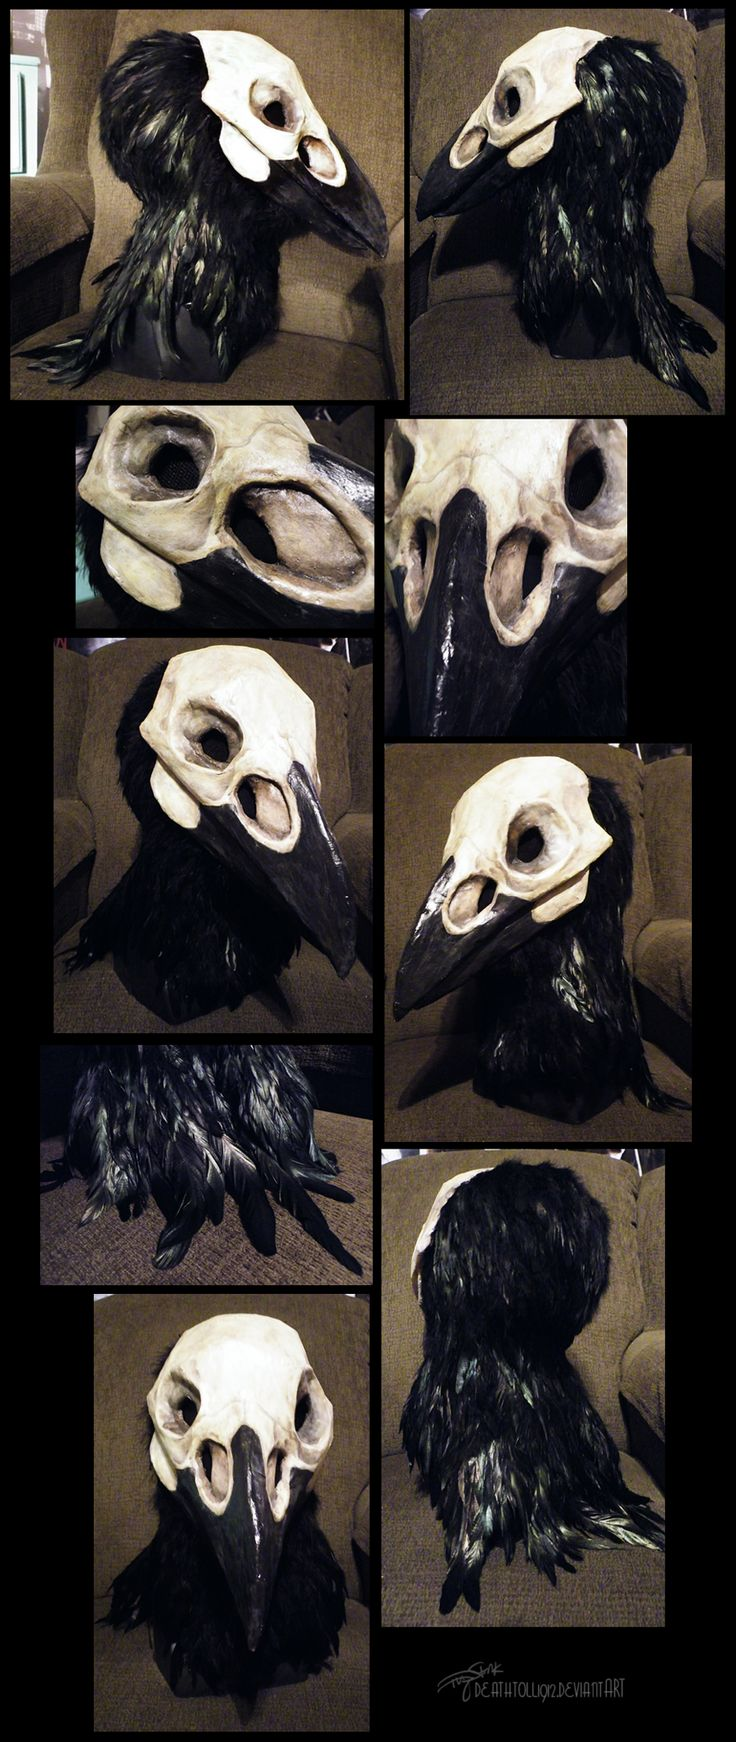 Black Aggie by deathtoll1912.deviantart.com on @deviantART